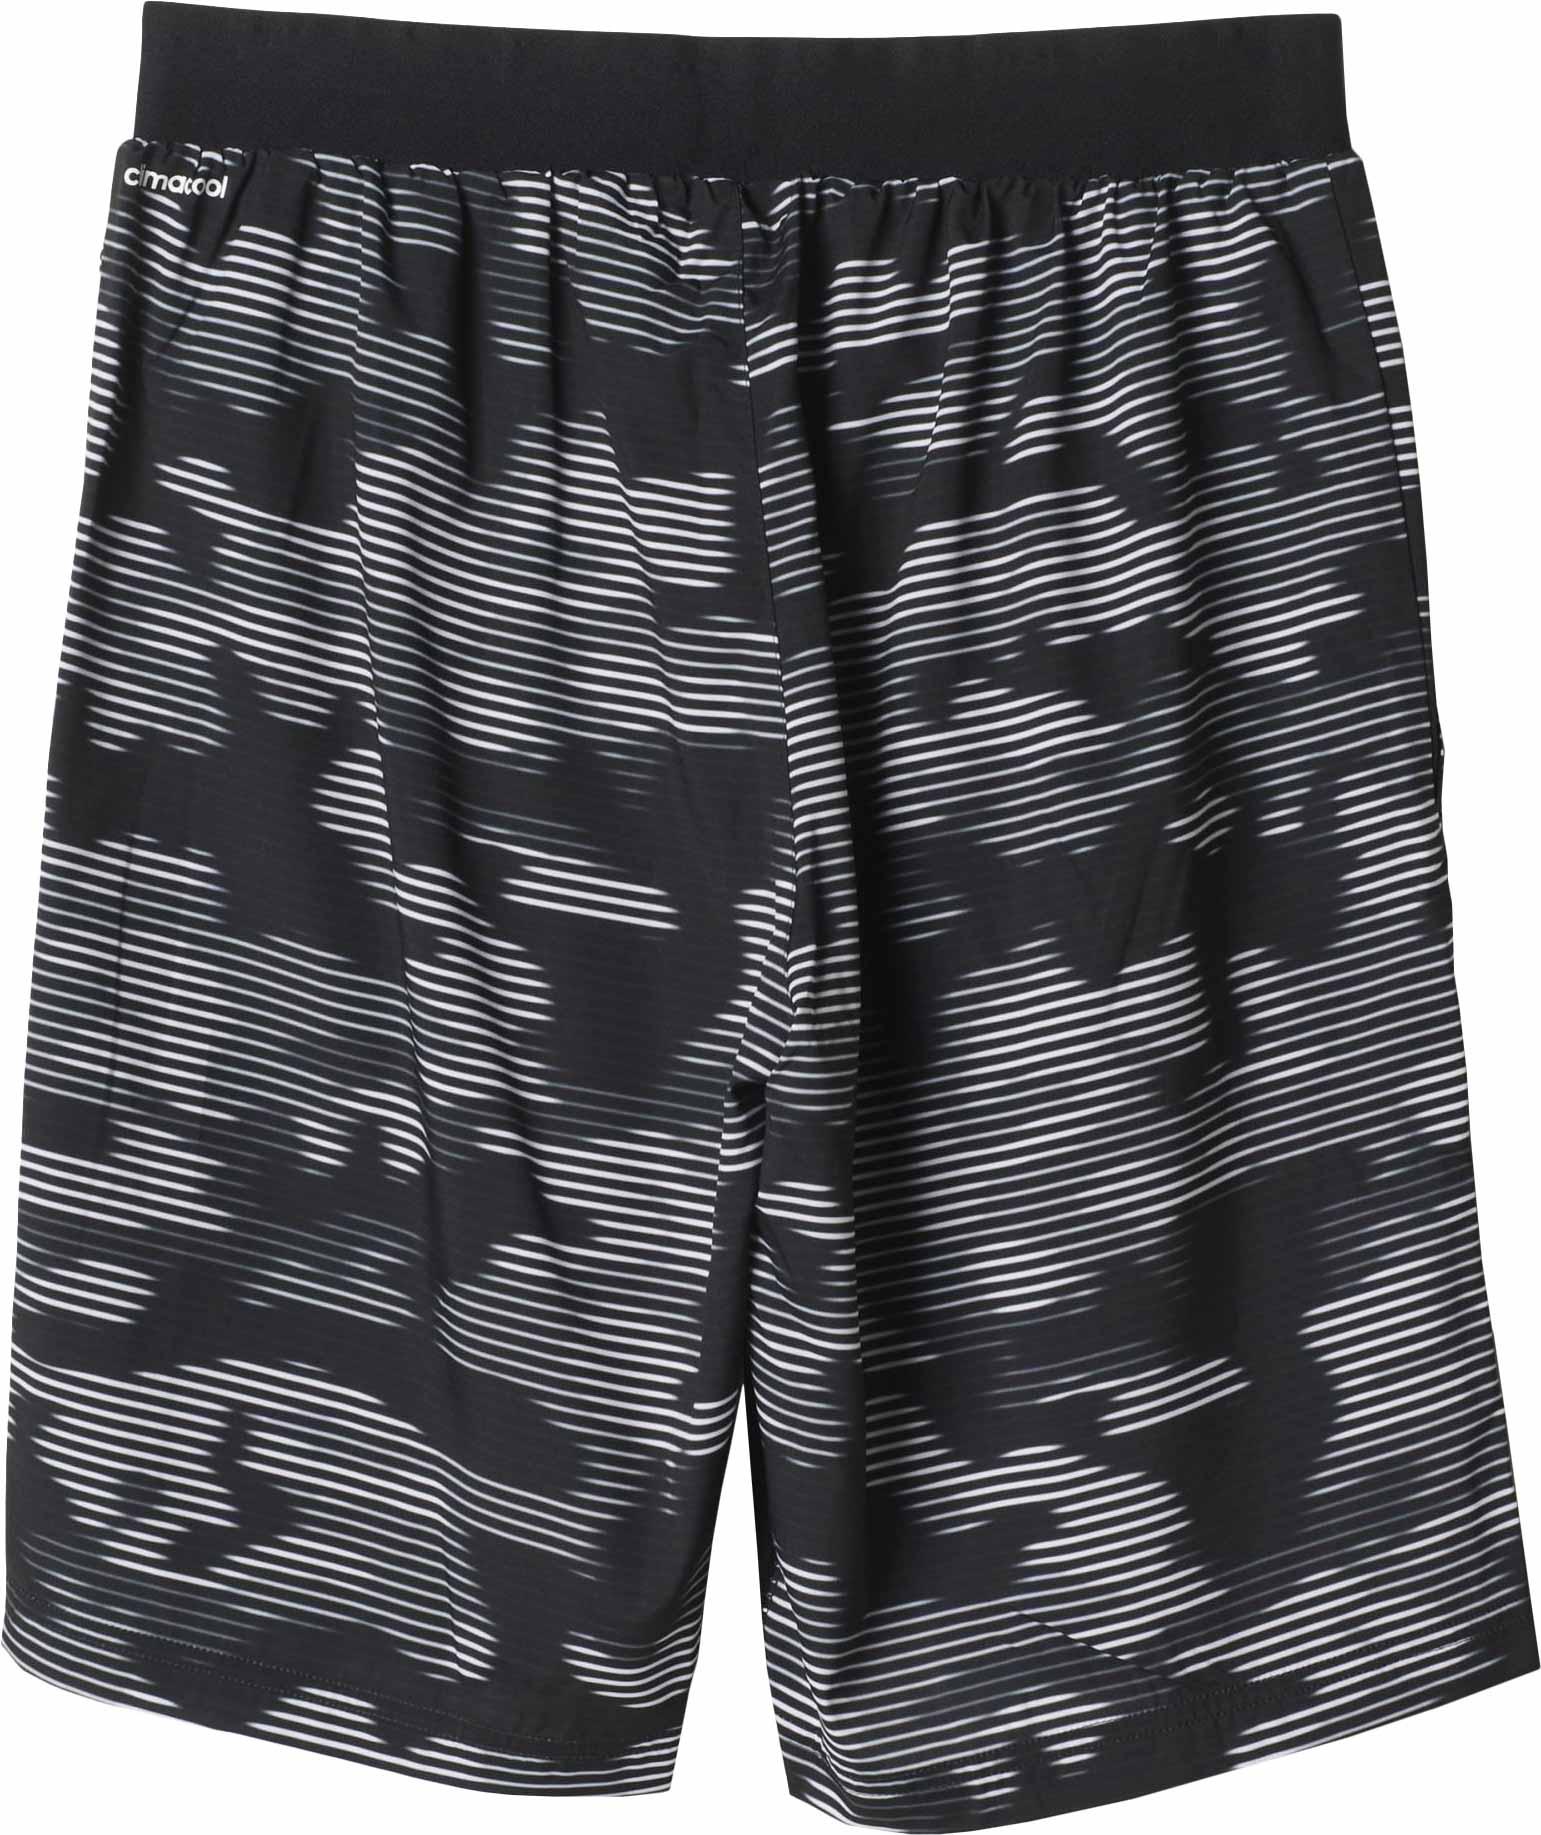 Response Trend Bermuda Shorts